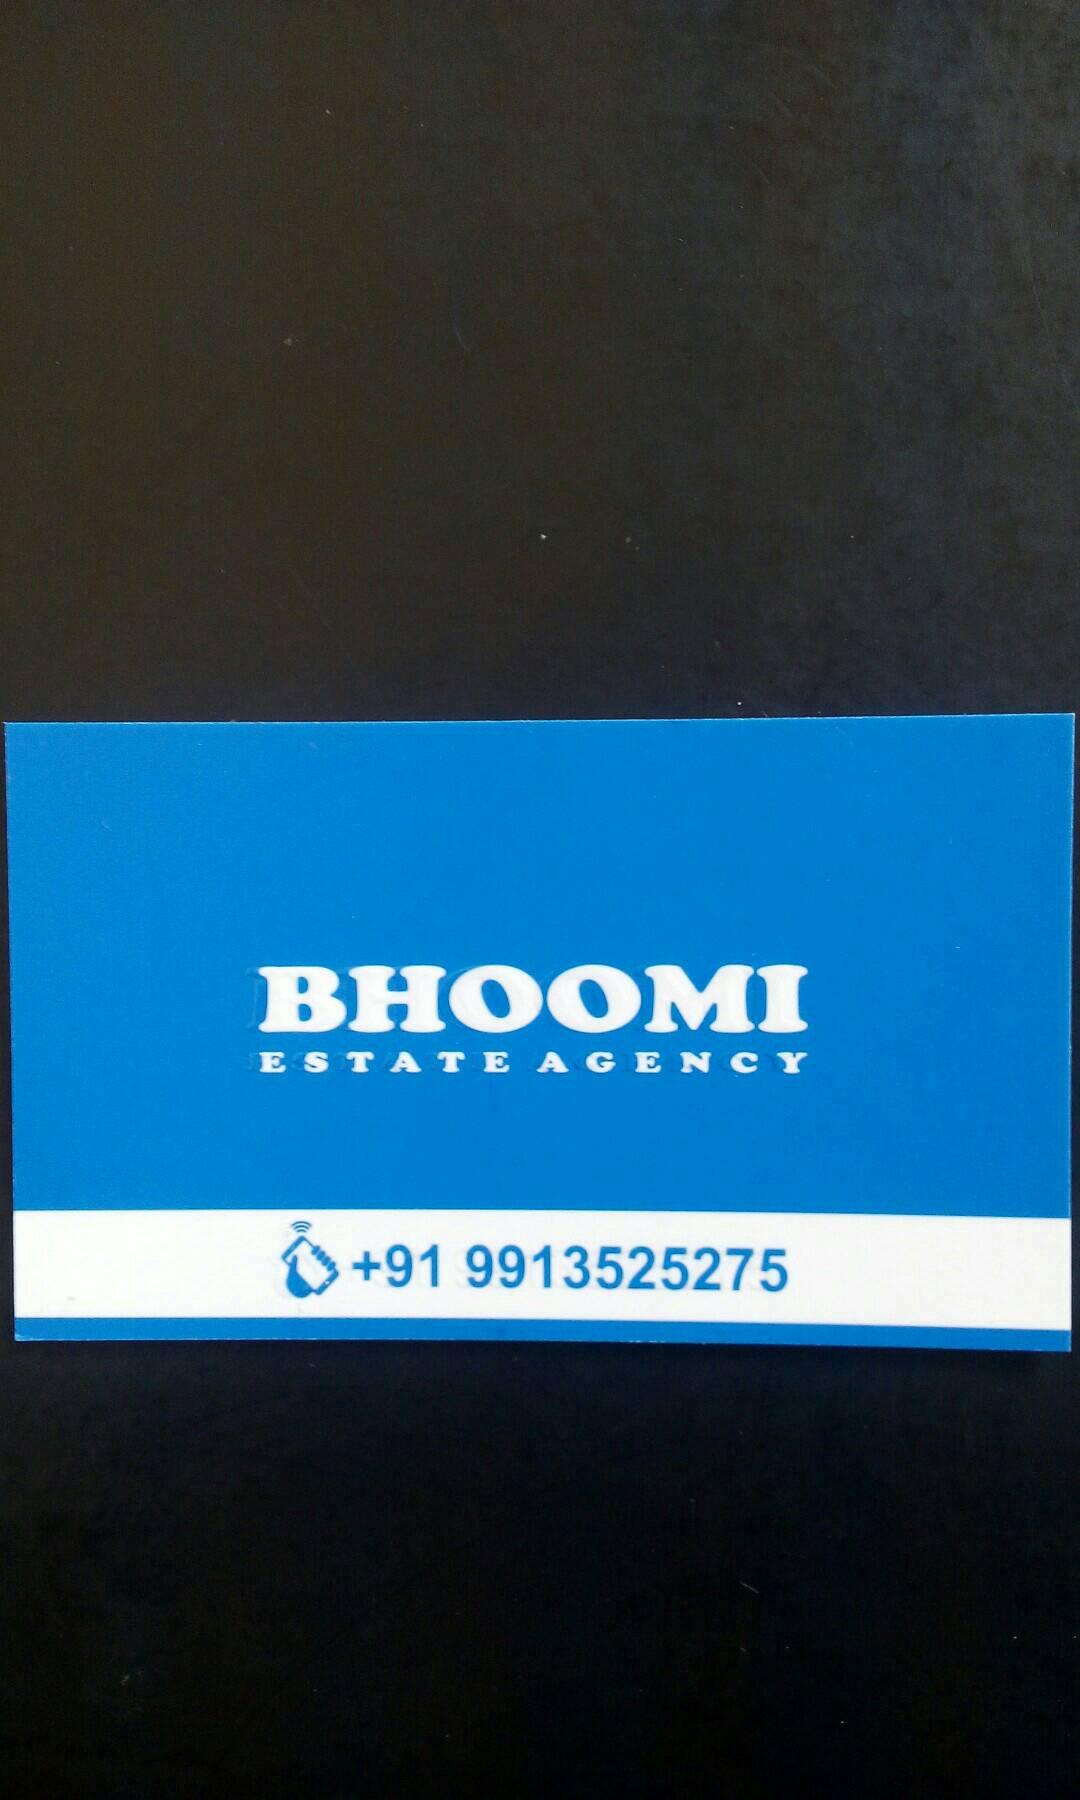 Bhoomi Estate Agency - logo